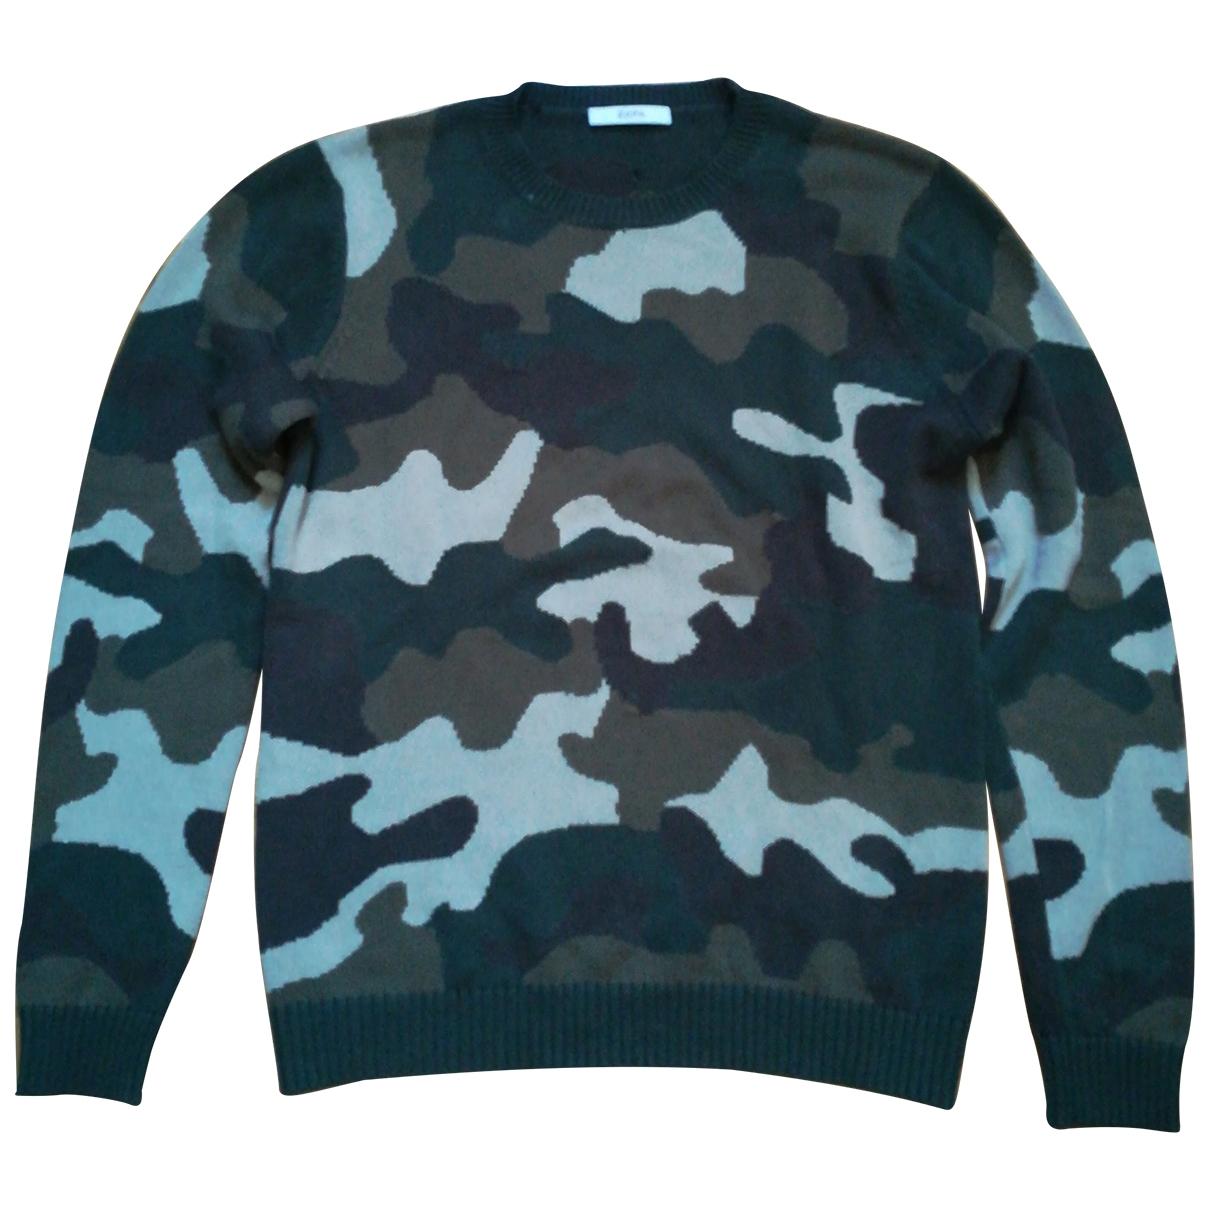 Zapa \N Khaki Cotton Knitwear & Sweatshirts for Men L International